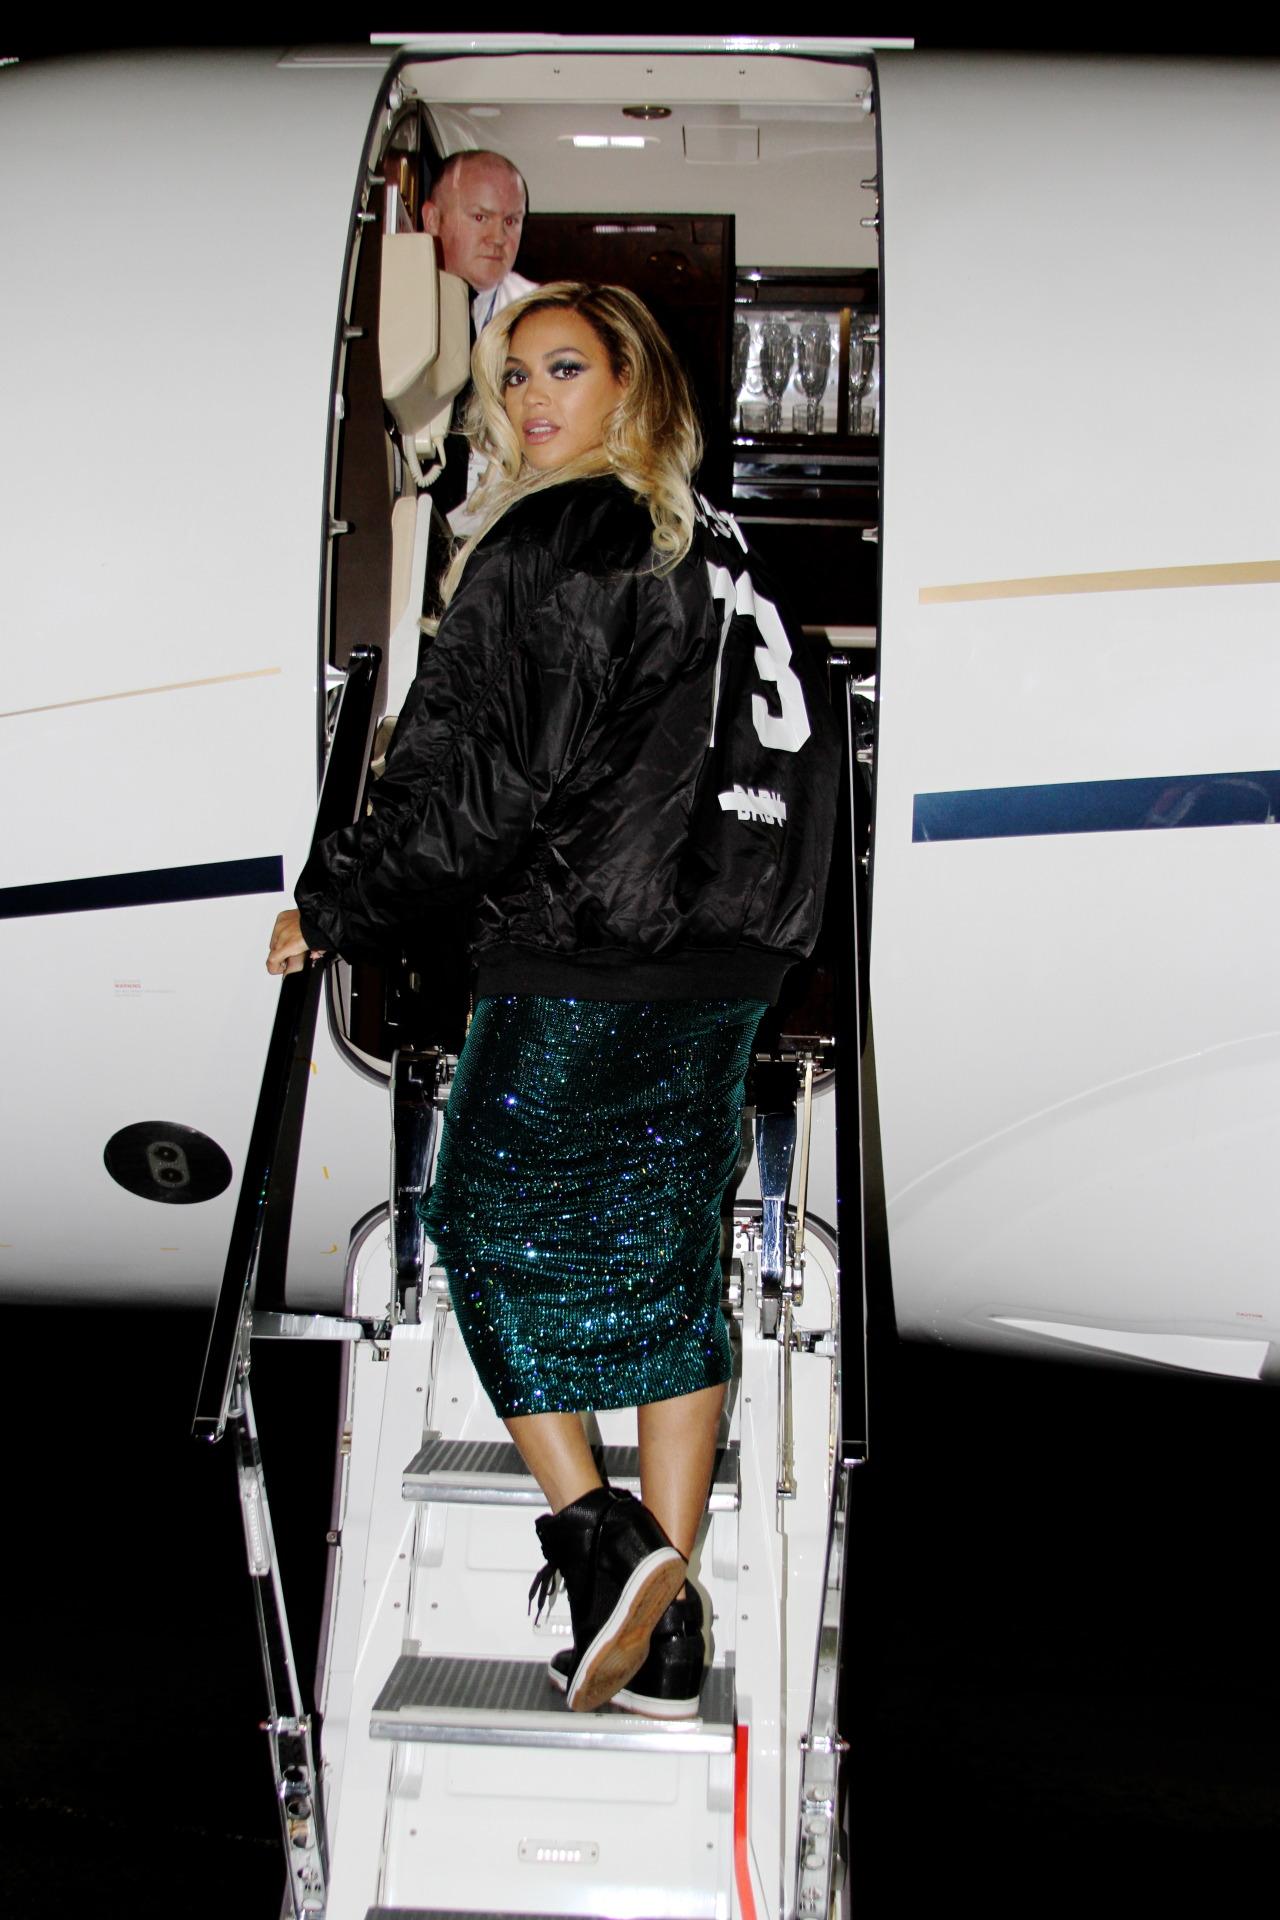 Beyoncé - Twitter (@Beyonce), Instagram (Baddiebey), Tumblr (I Am...) [II] - Página 3 Tumblr_n19kz9tYTz1rqgjz2o1_1280